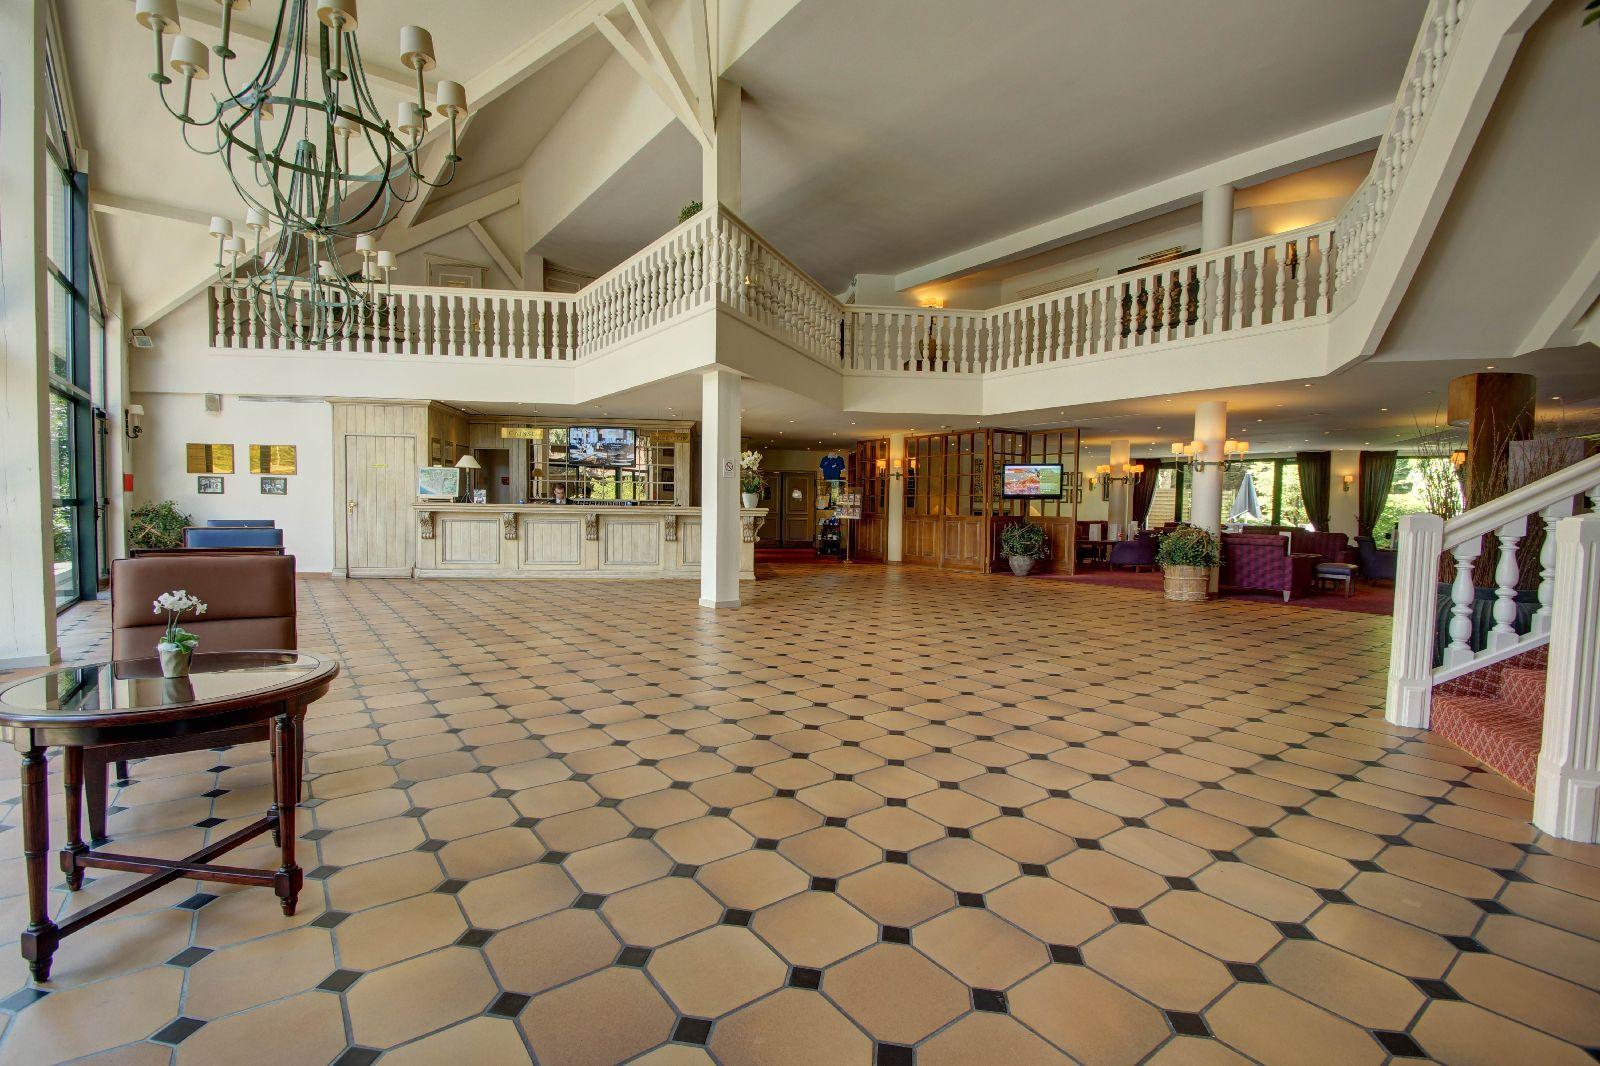 golf-expedition-golf-reizen-frankrijk-regio-pas-de-calais-hotel-du-parc-ontvangstruimte-trap-klassiek-ingericht.jpg